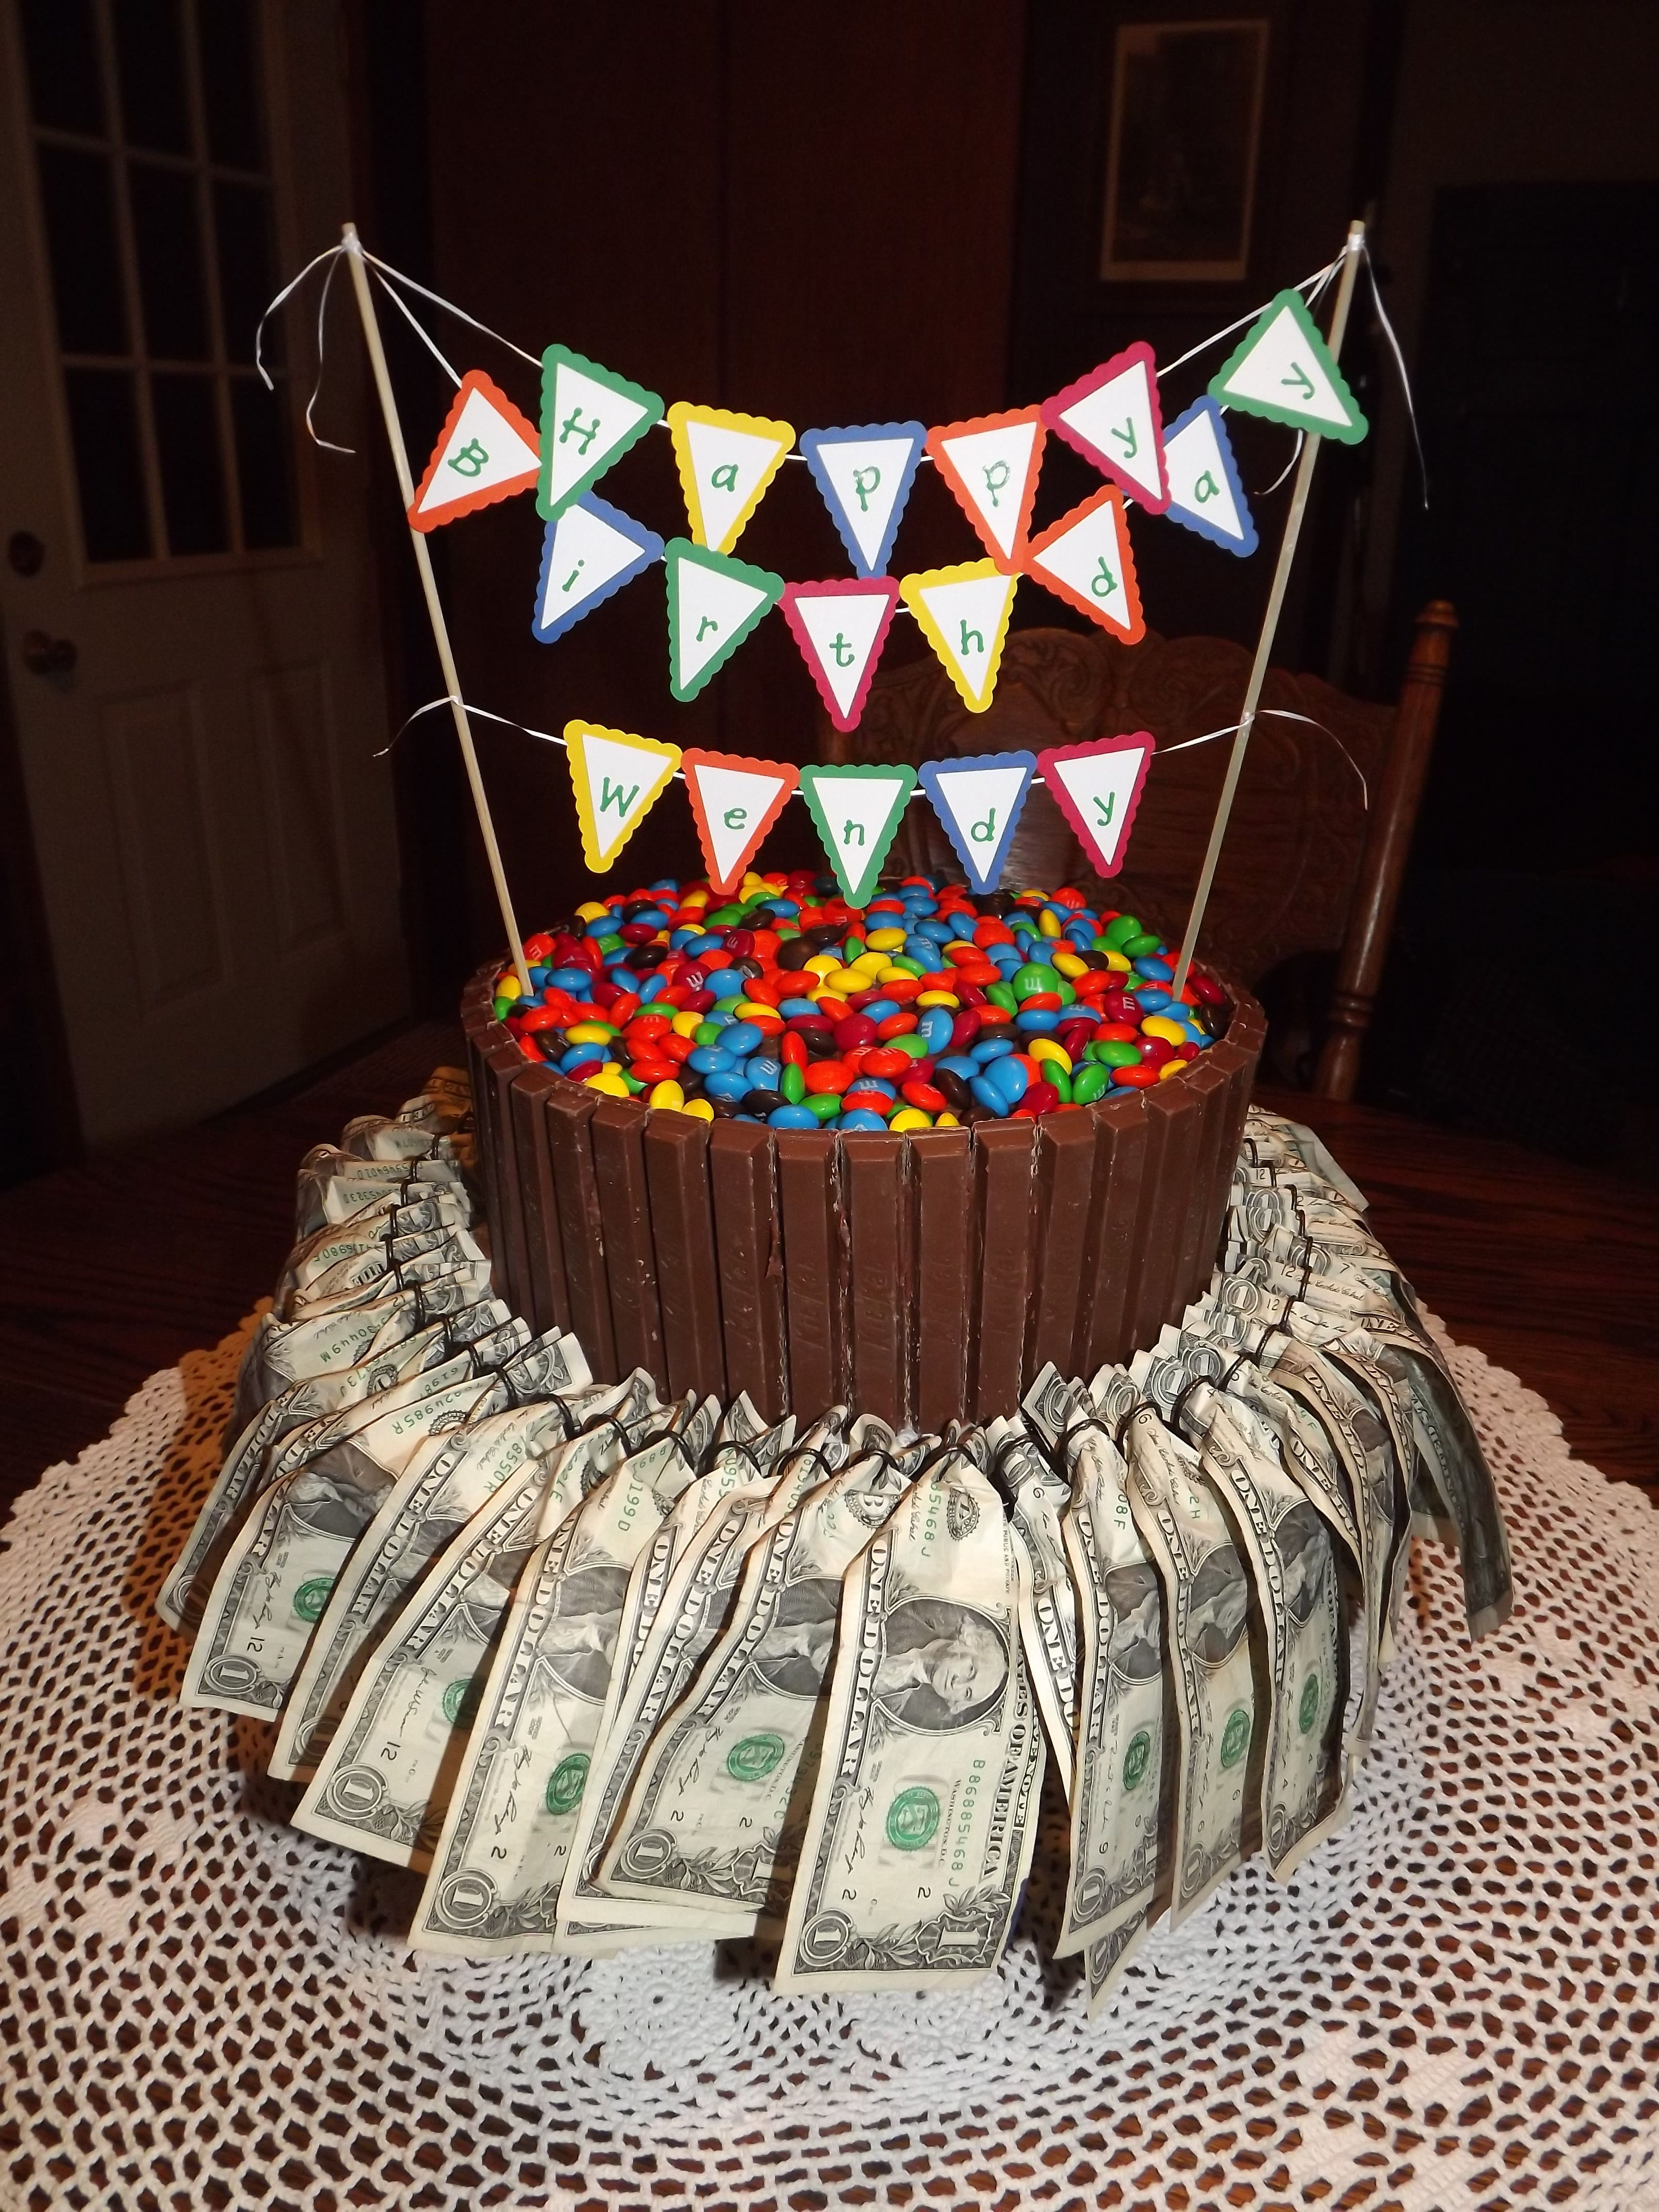 50th birthday cake with 50 one dollar bills HINT HINTI turn 50